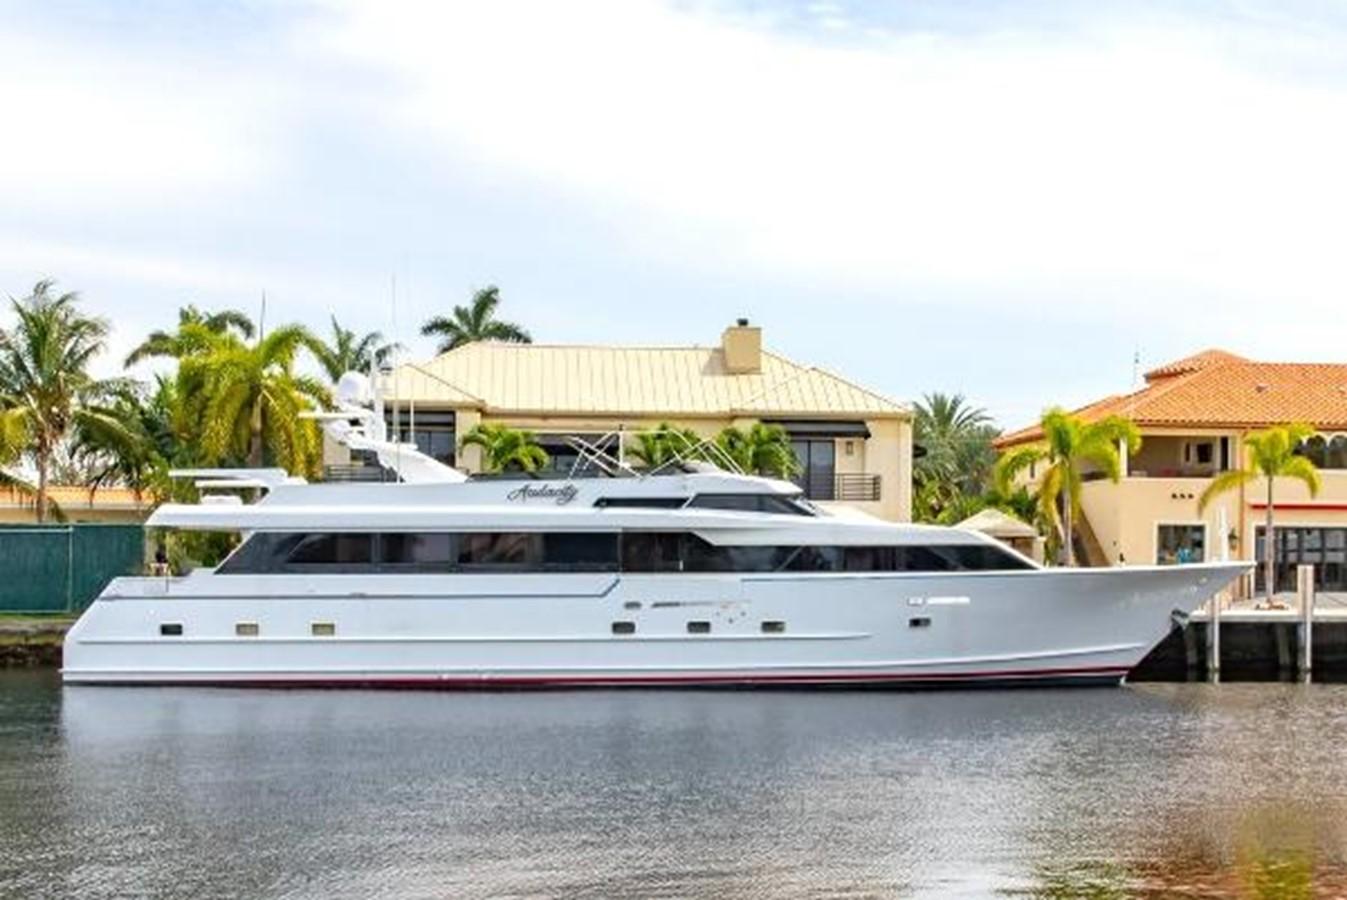 1990 BROWARD Raised Bridge Motor Yacht For Sale